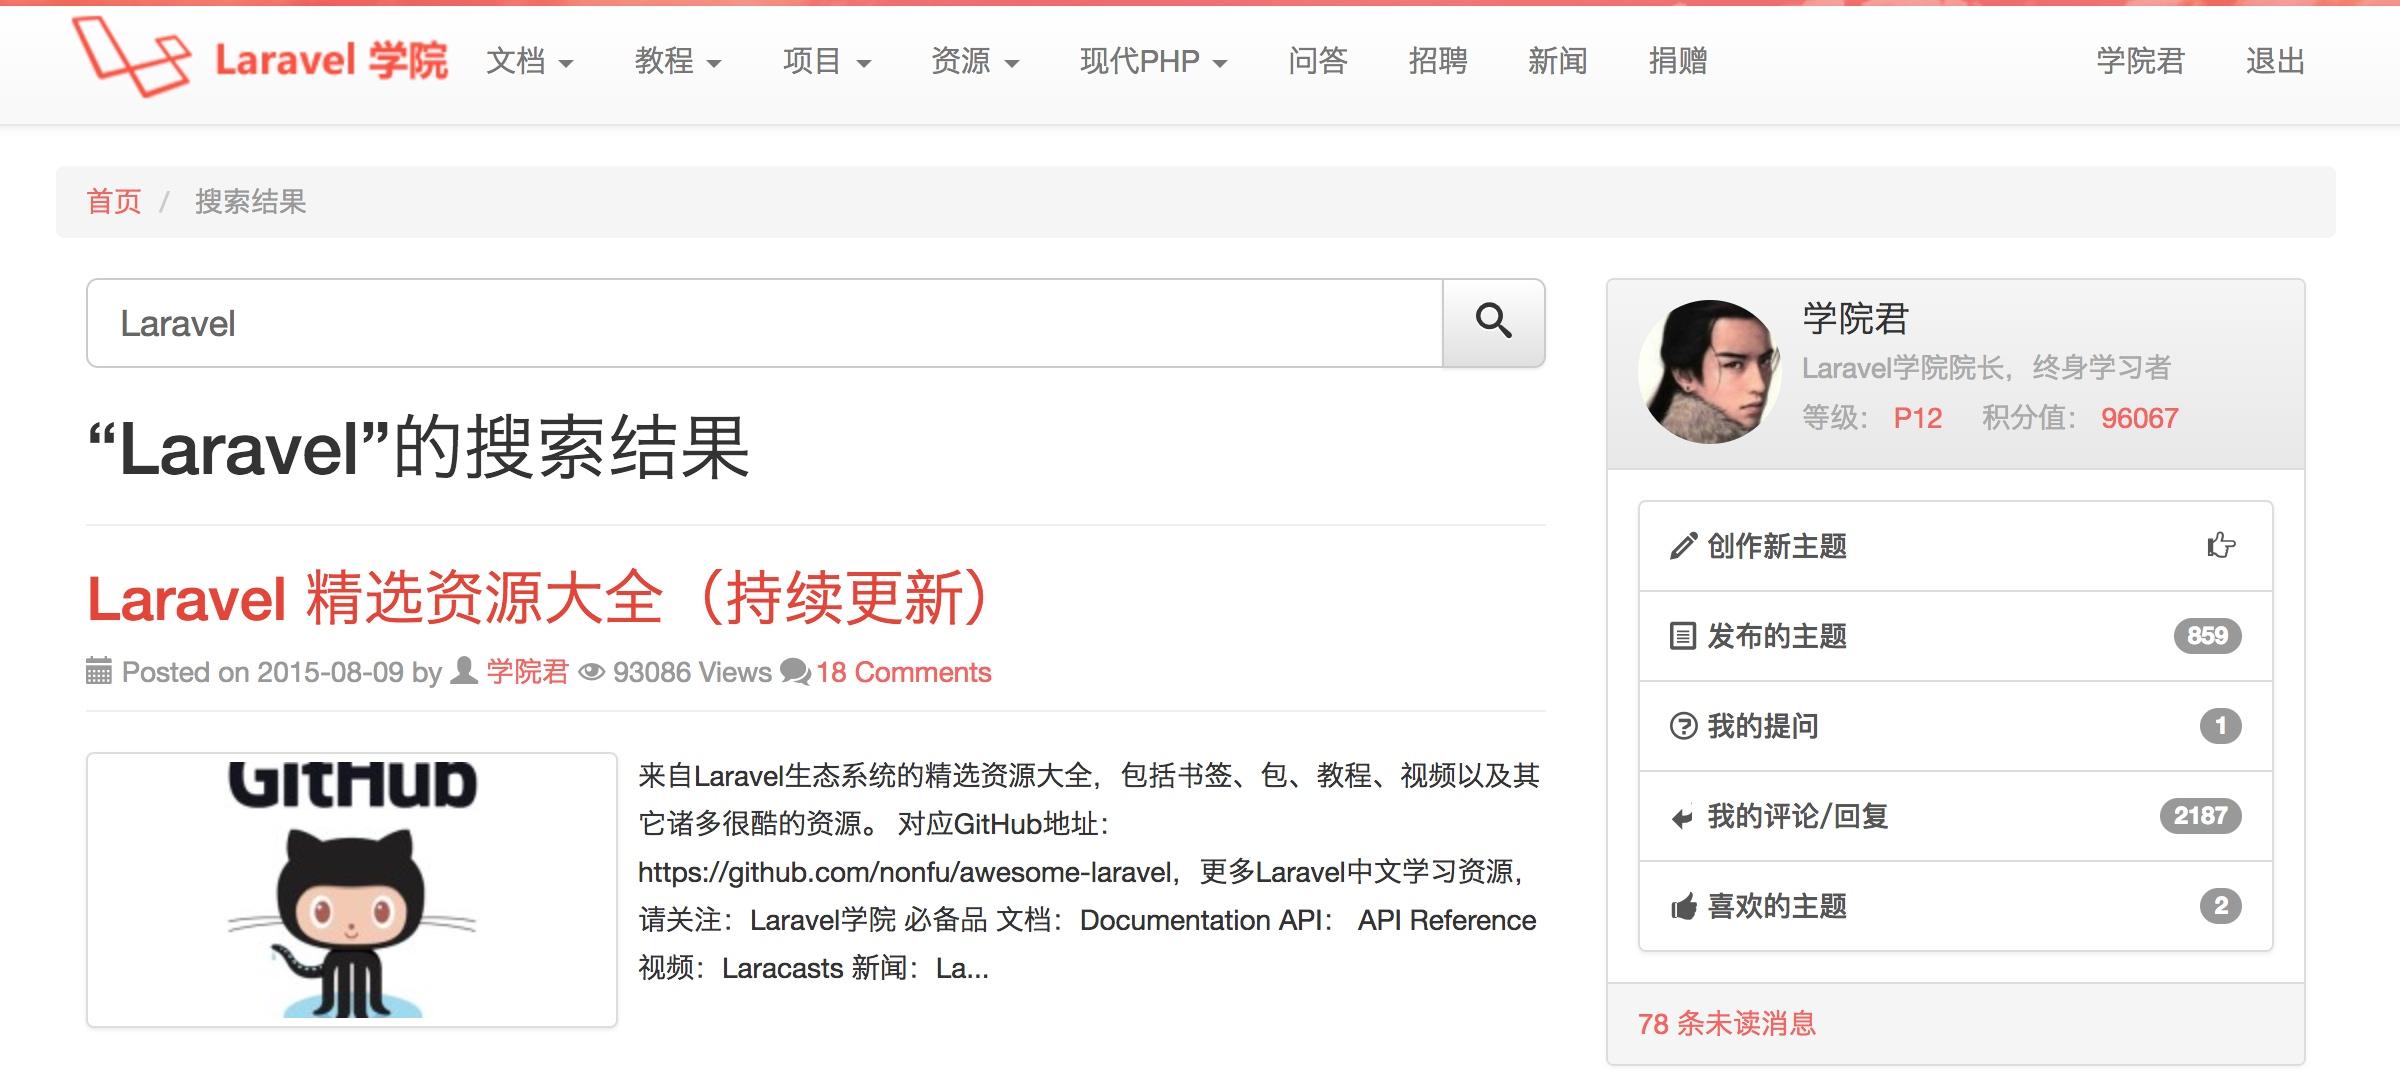 Laravel学院搜索页面